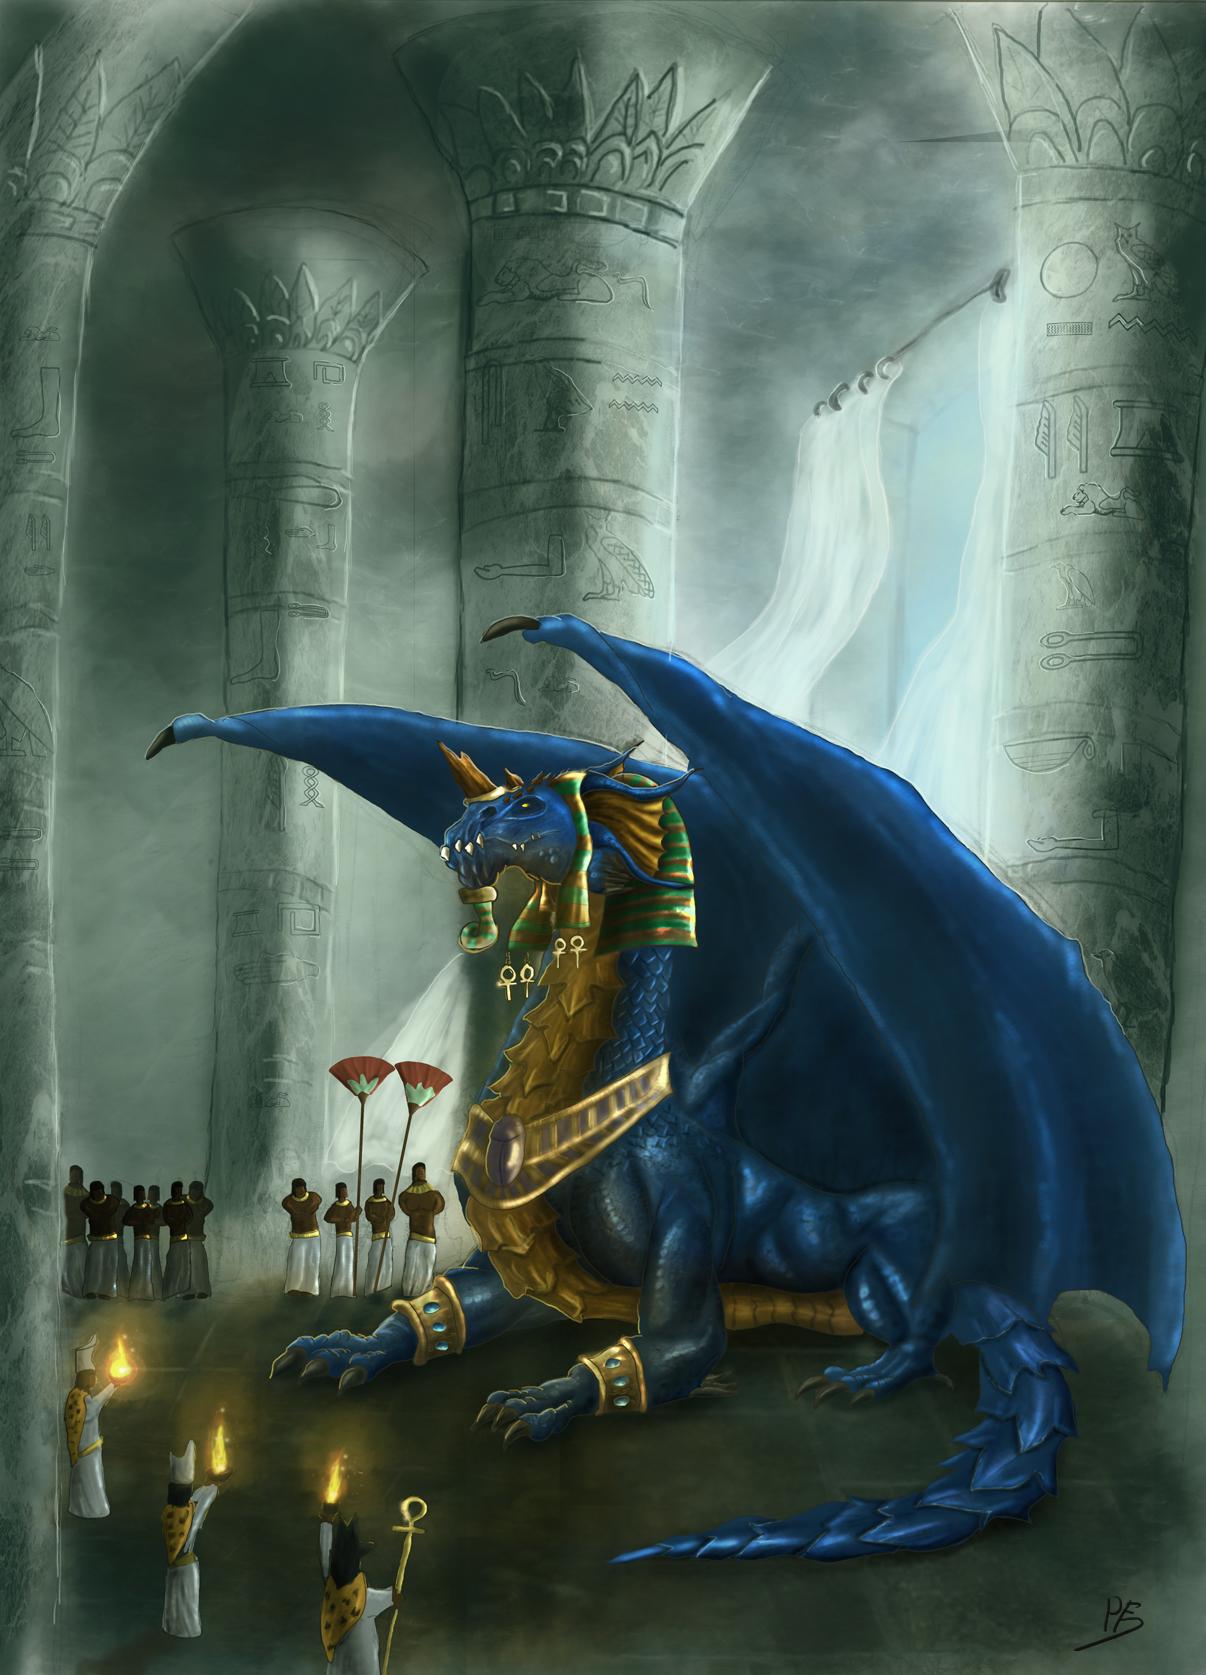 The Suzerain of Egypt by Netarliargus